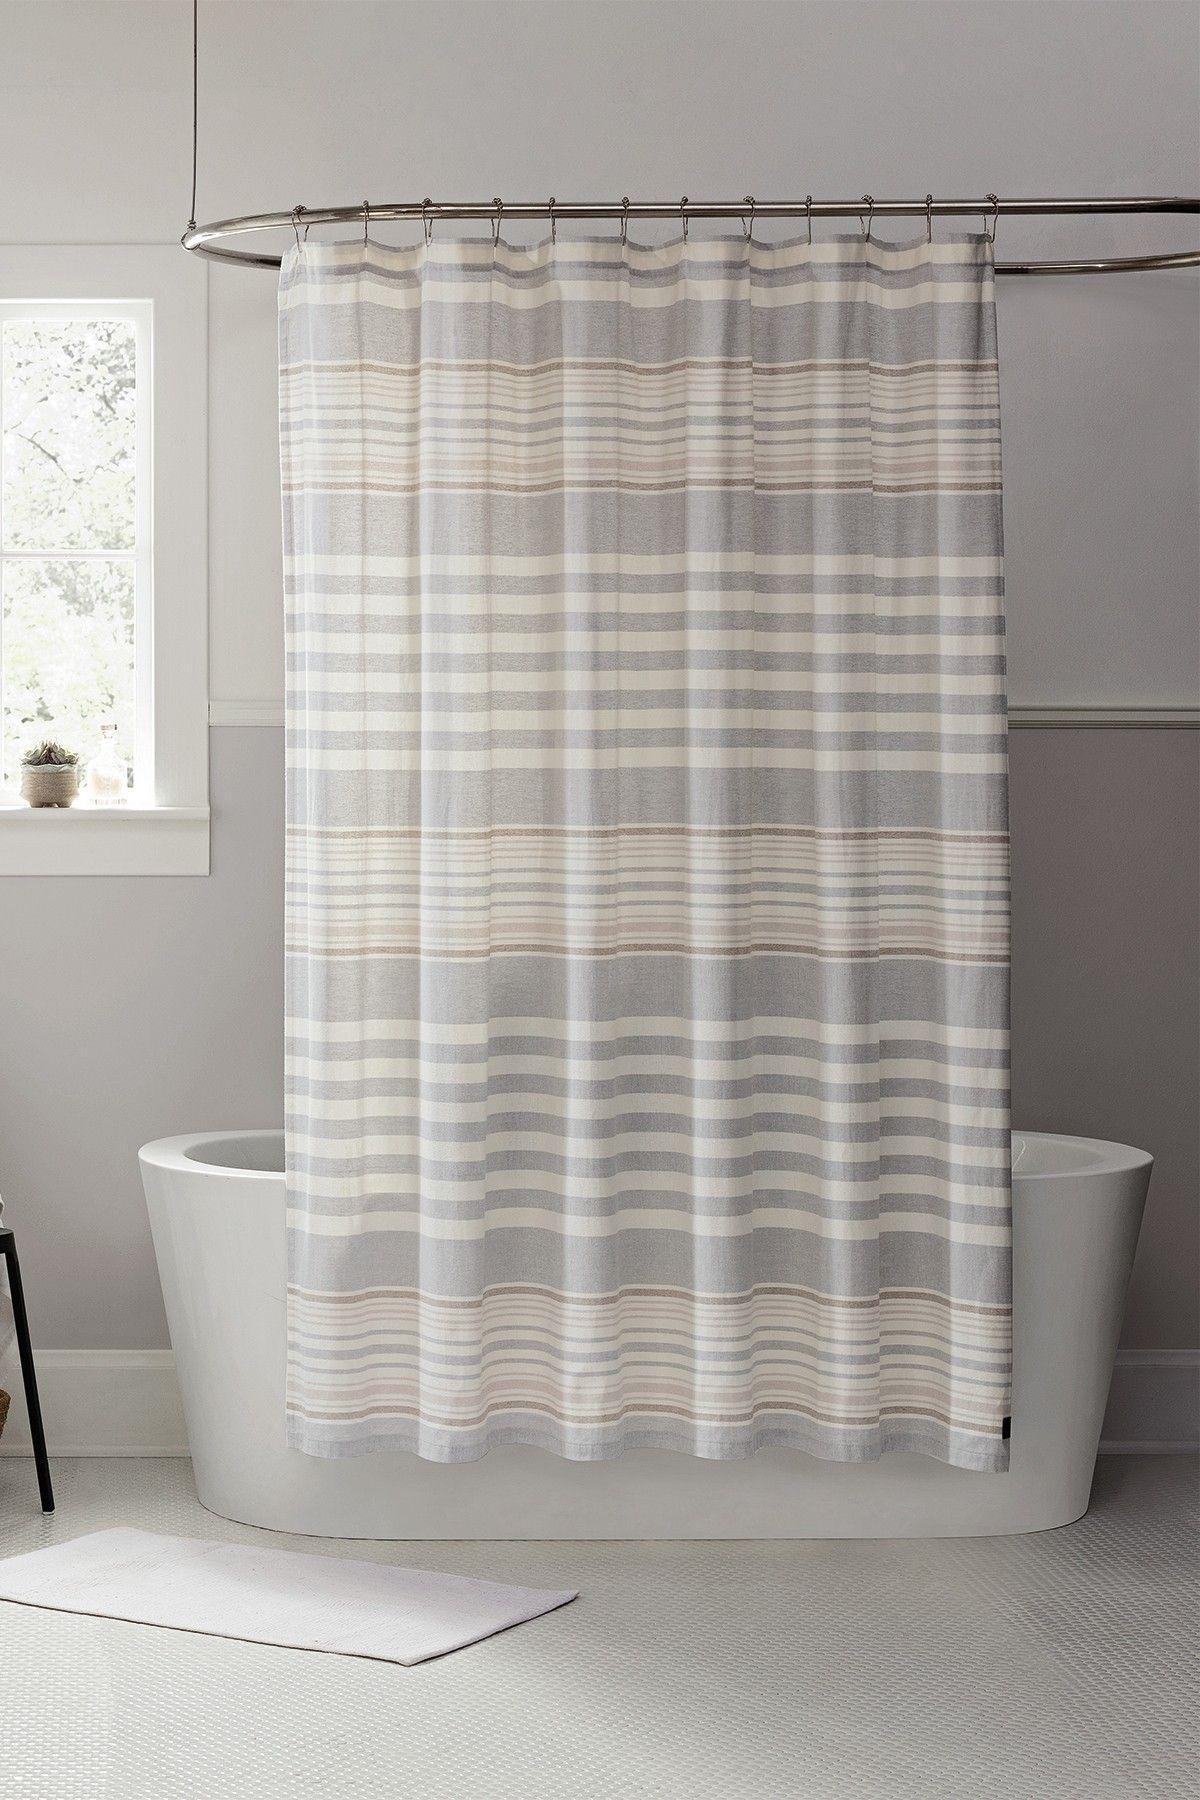 Ugg Seal Lunar Stripe Shower Curtain Striped Shower Curtains Modern Bathroom Decor Shower Curtain